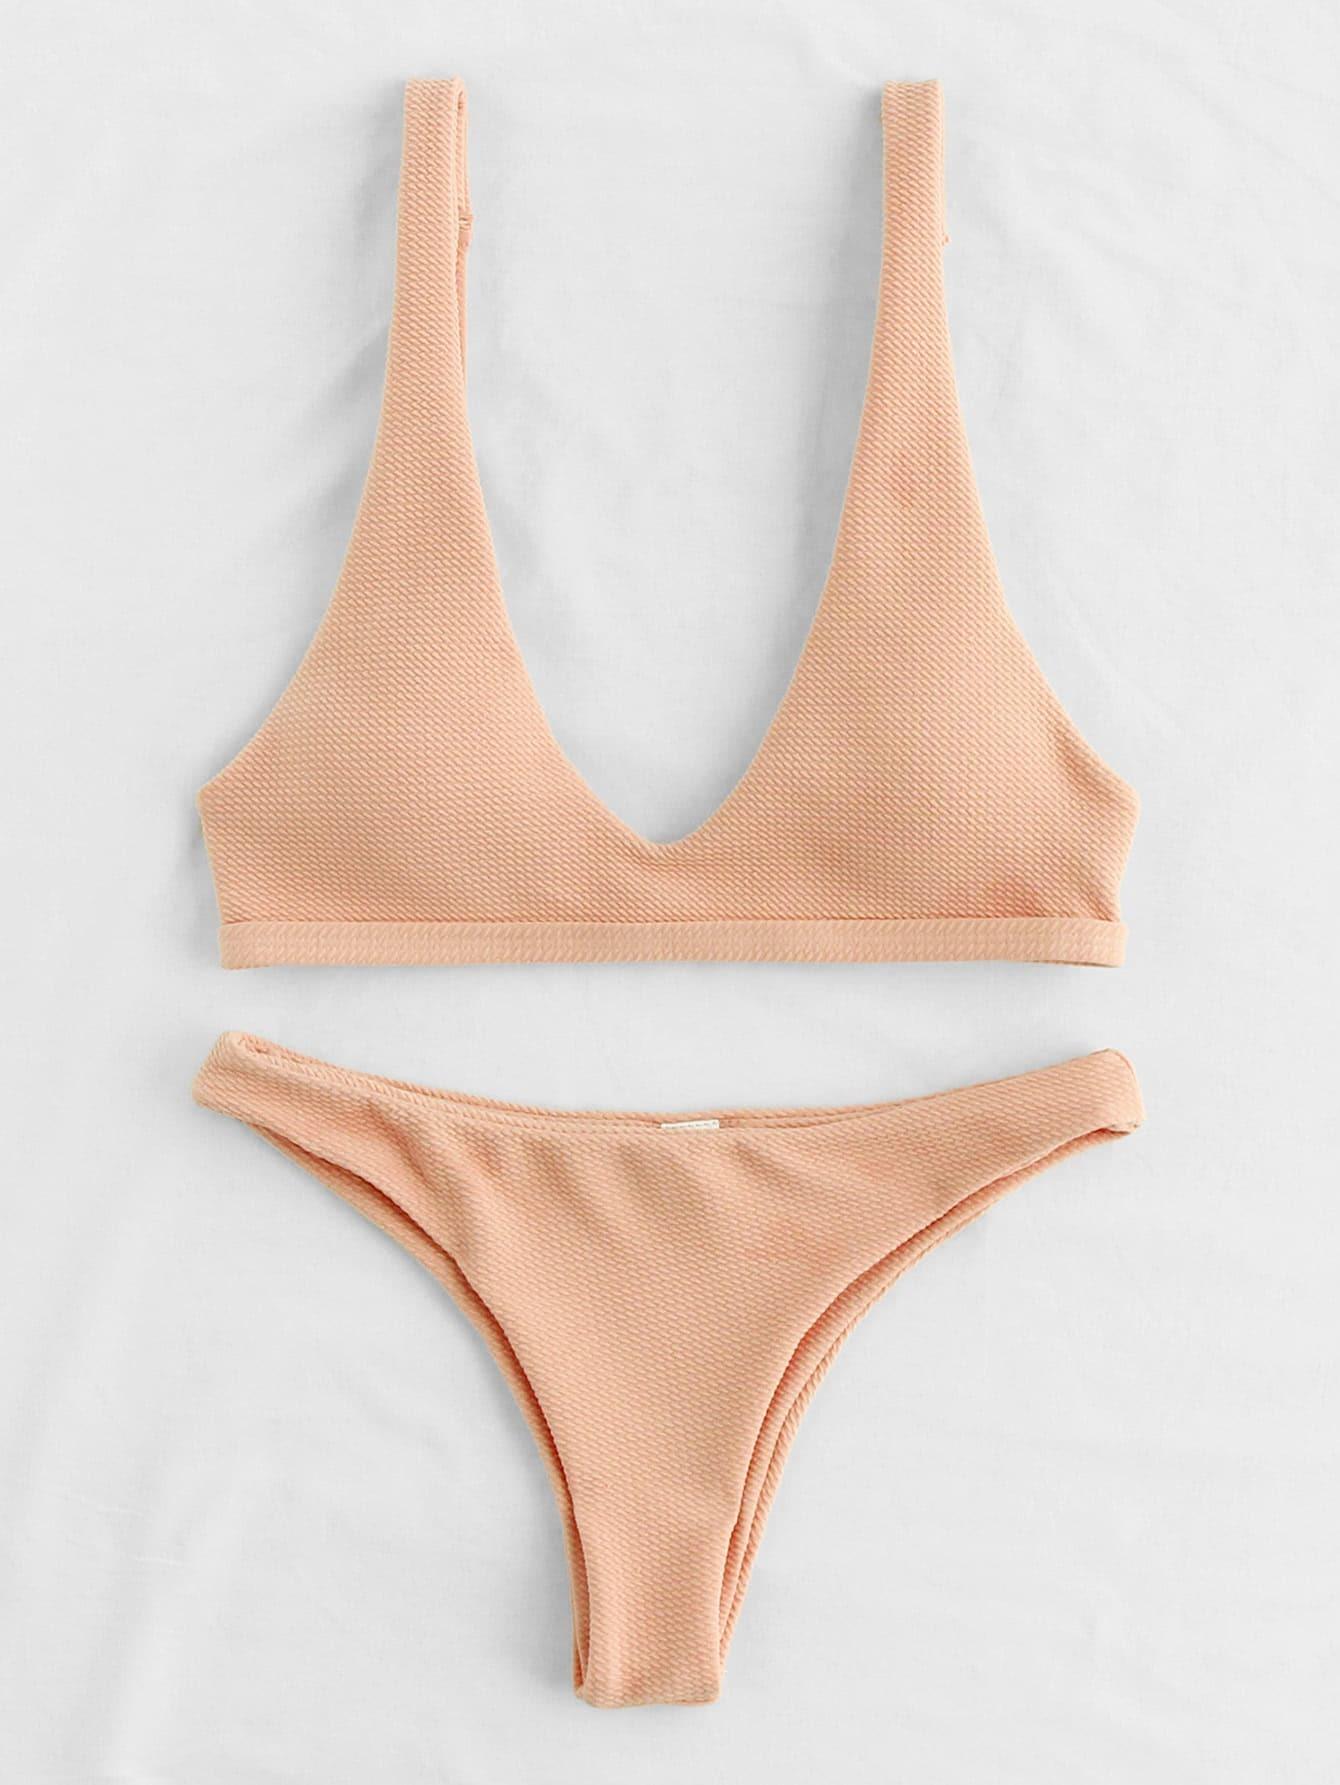 Plunge Neckline Open Back Bikini Set plunge neckline open back bikini set